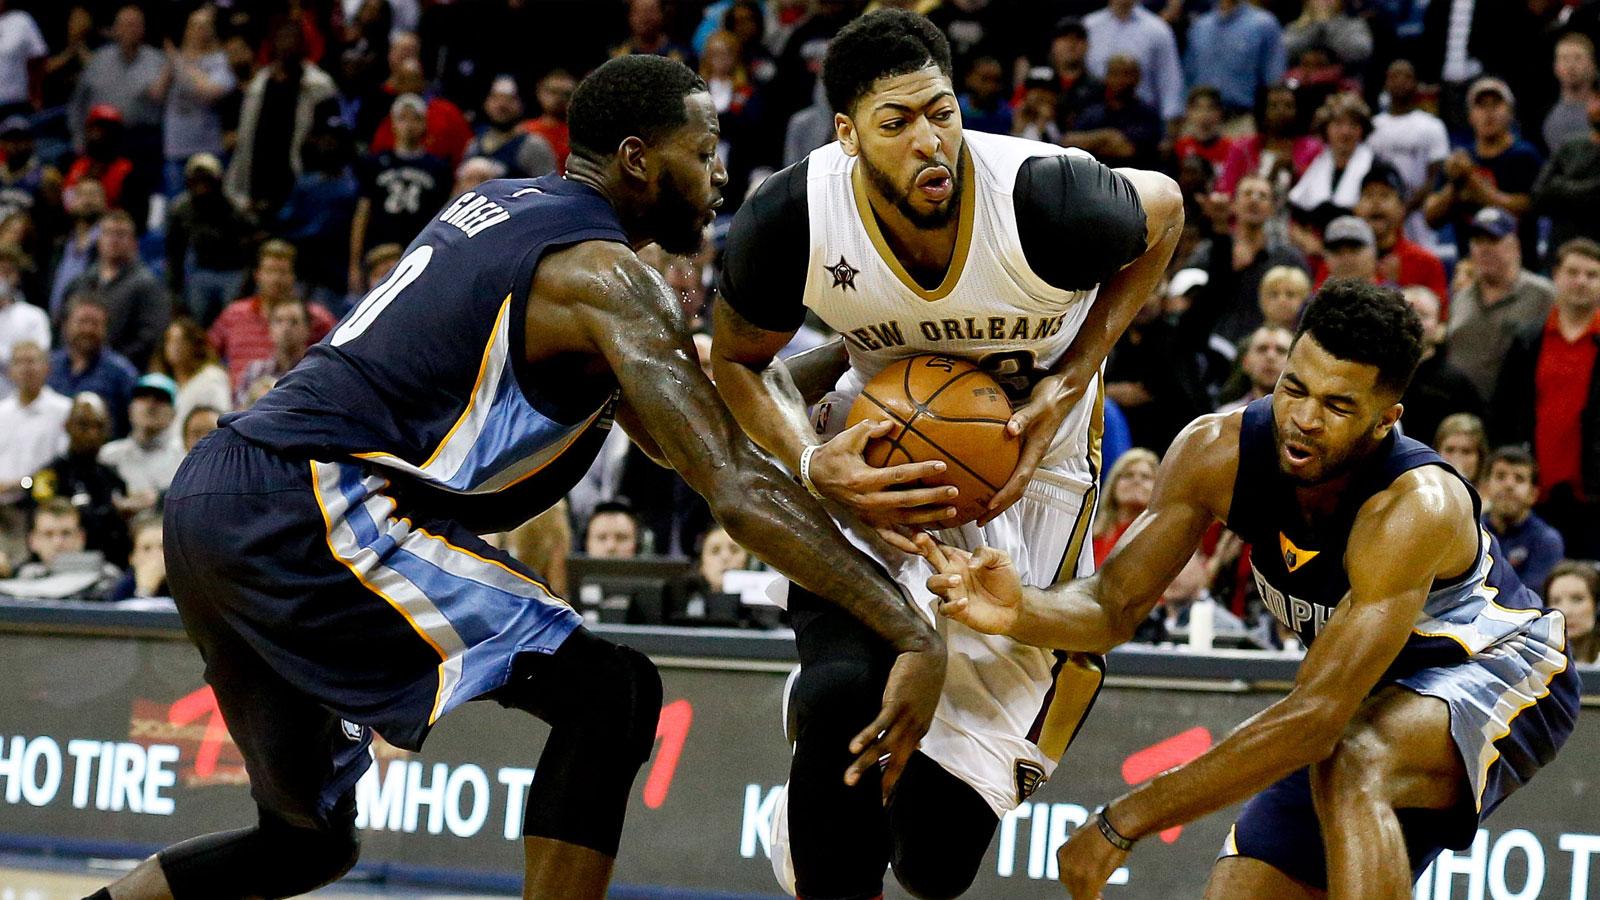 Gasol, Grizzlies outlast Pelicans, 110-108 in double OT